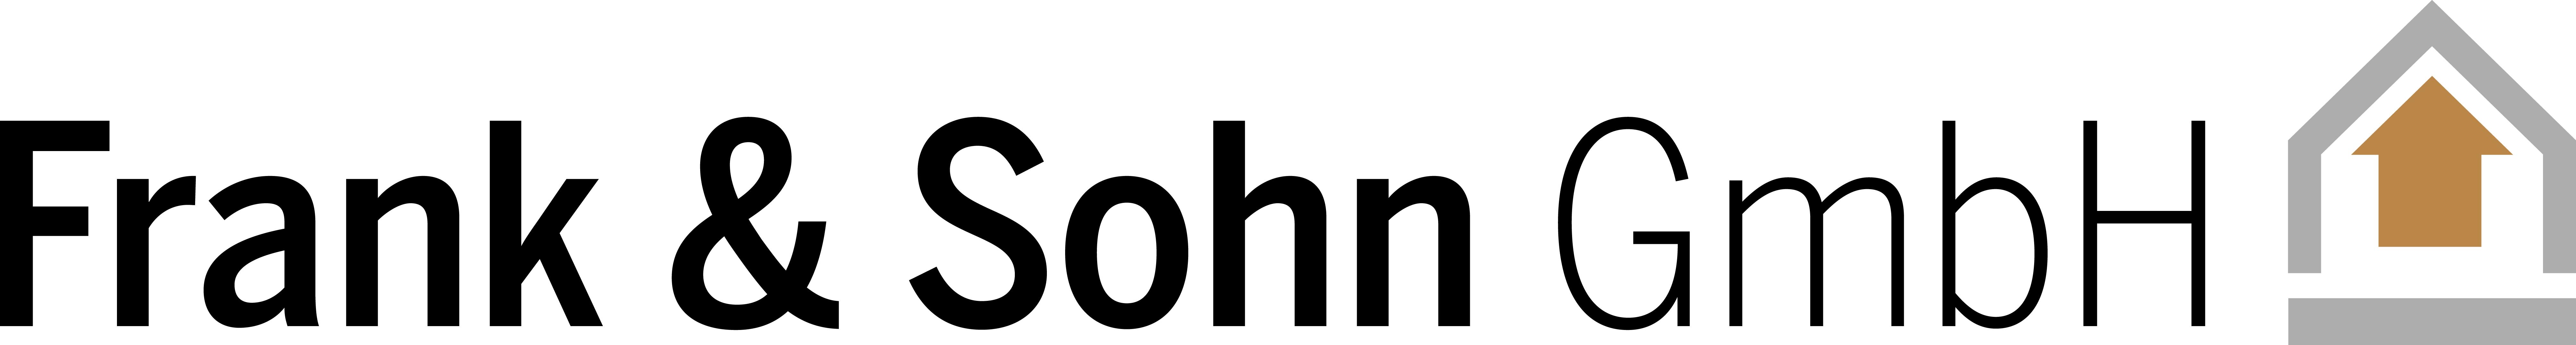 Frank & Sohn GmbH